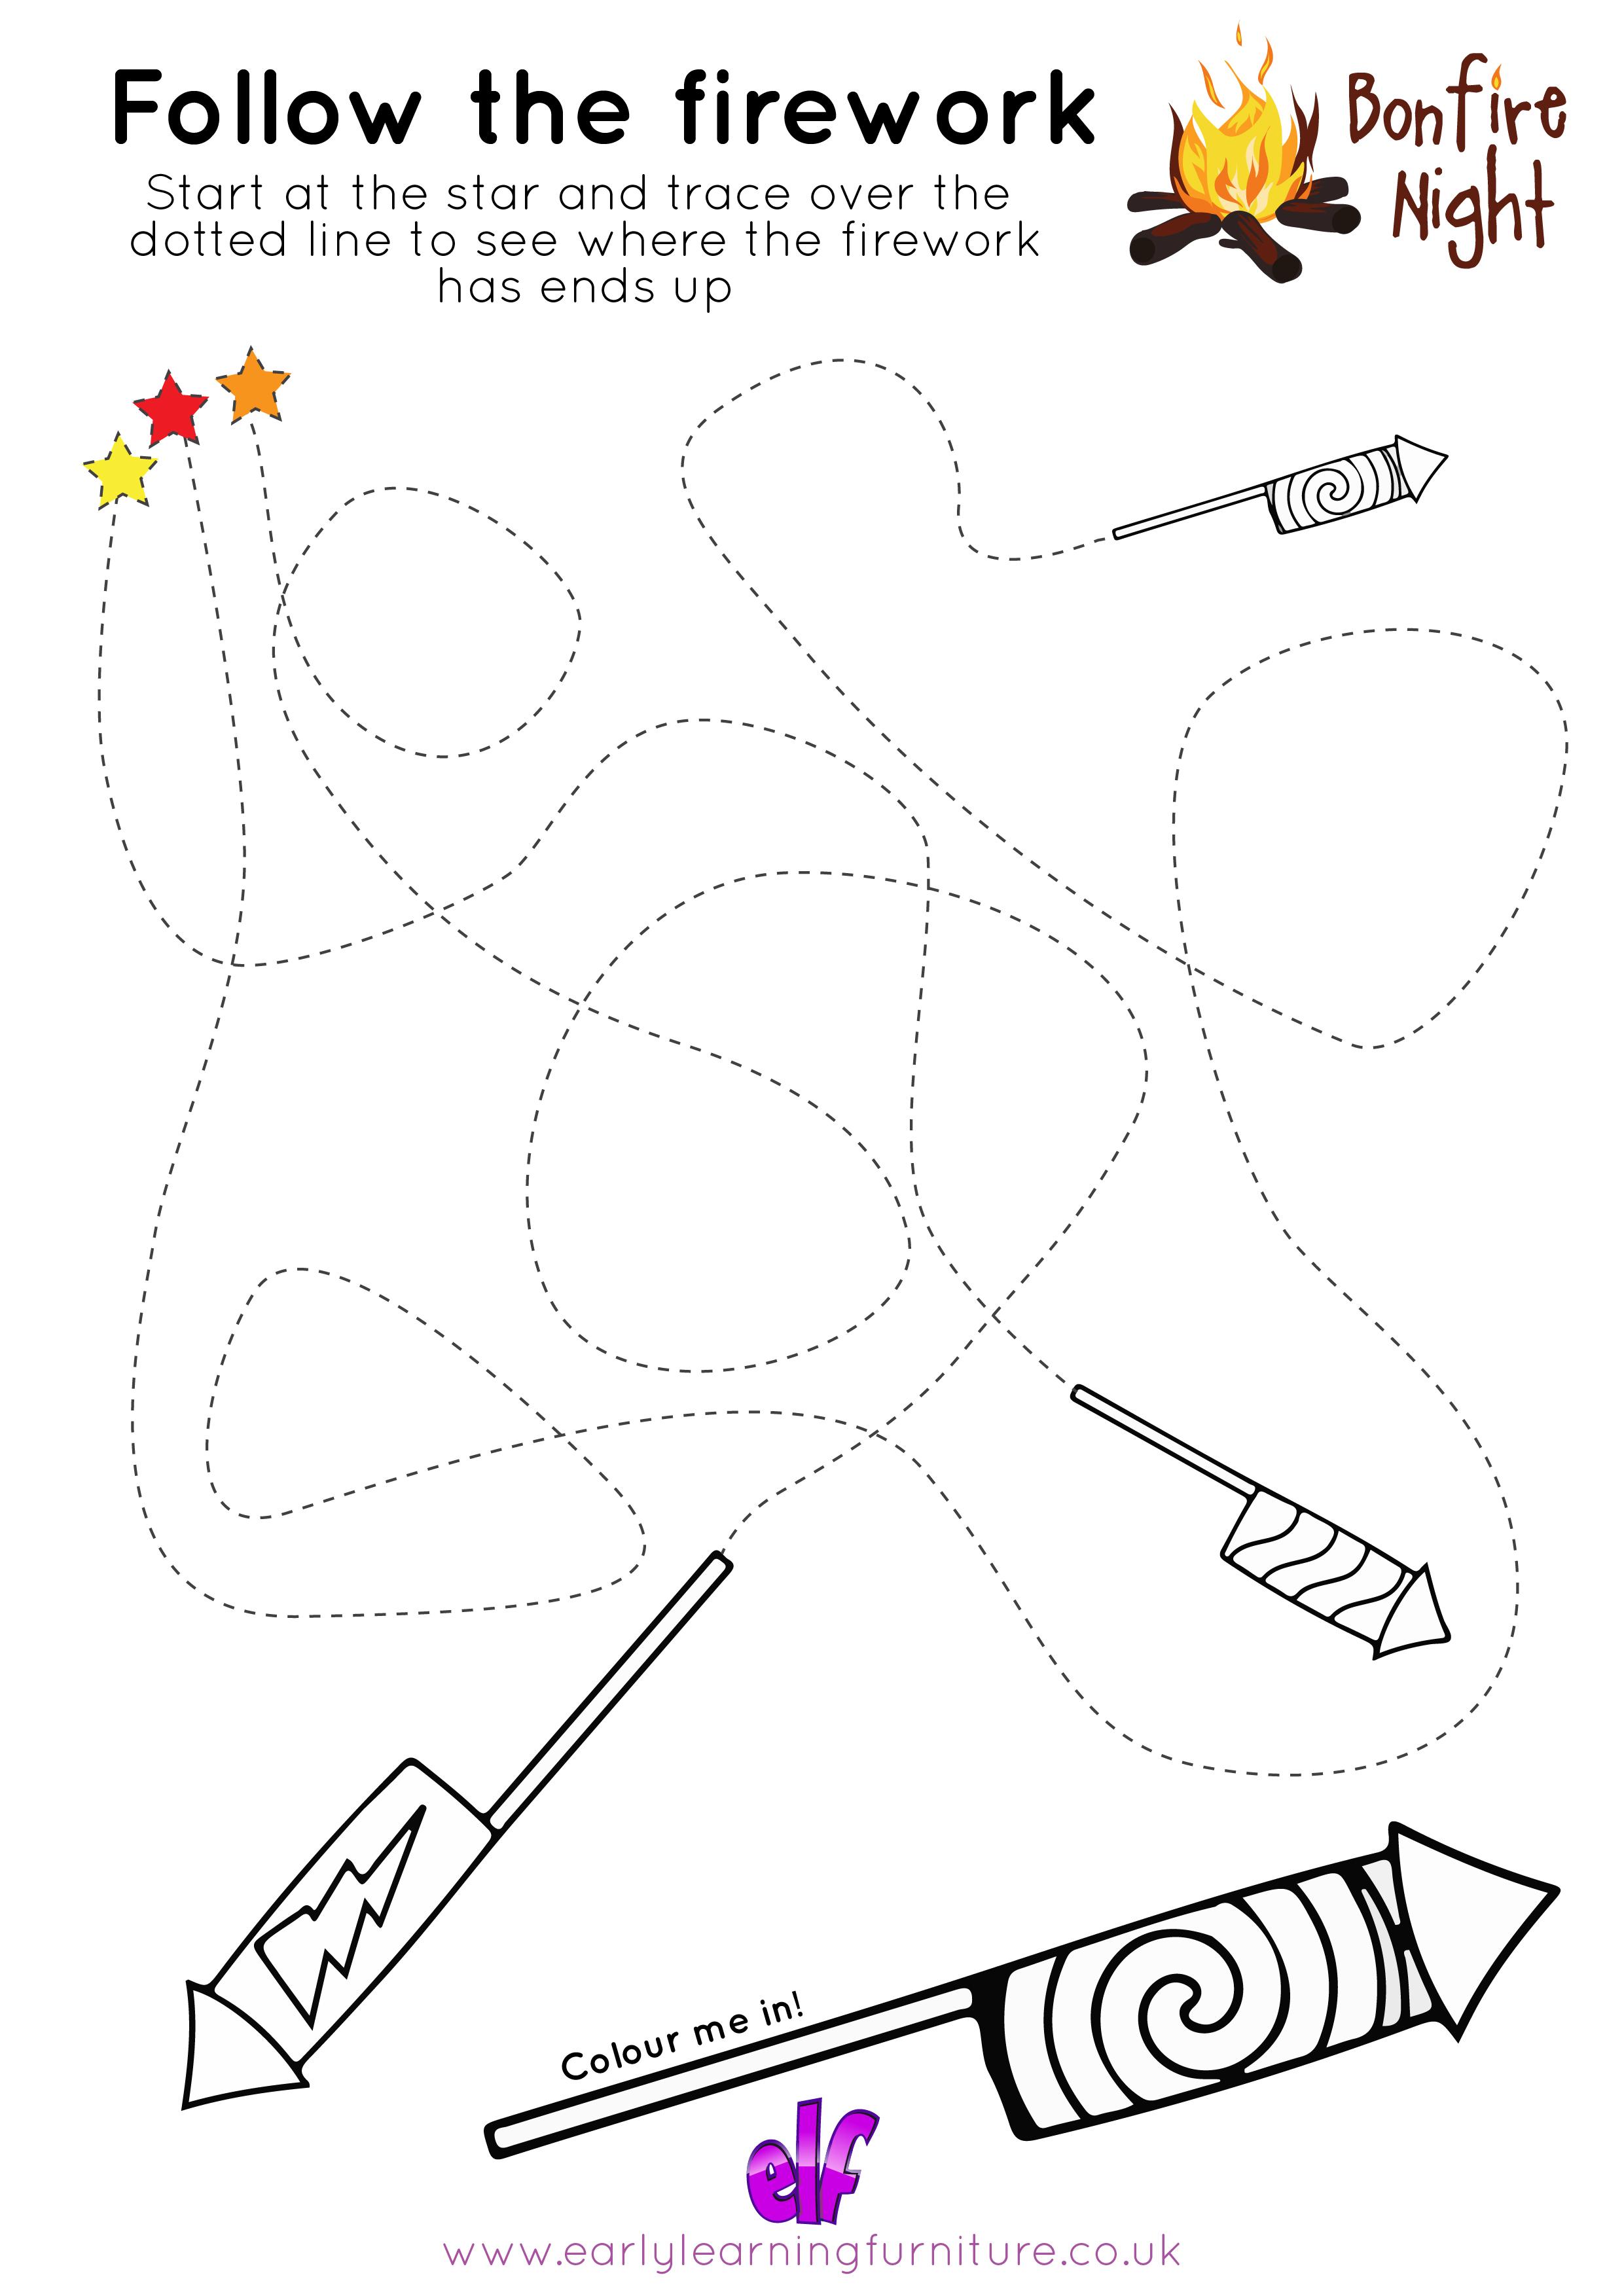 Bonfire Night Printable Activities And Worksheets | Free Teaching | Printable Pencil Control Worksheets